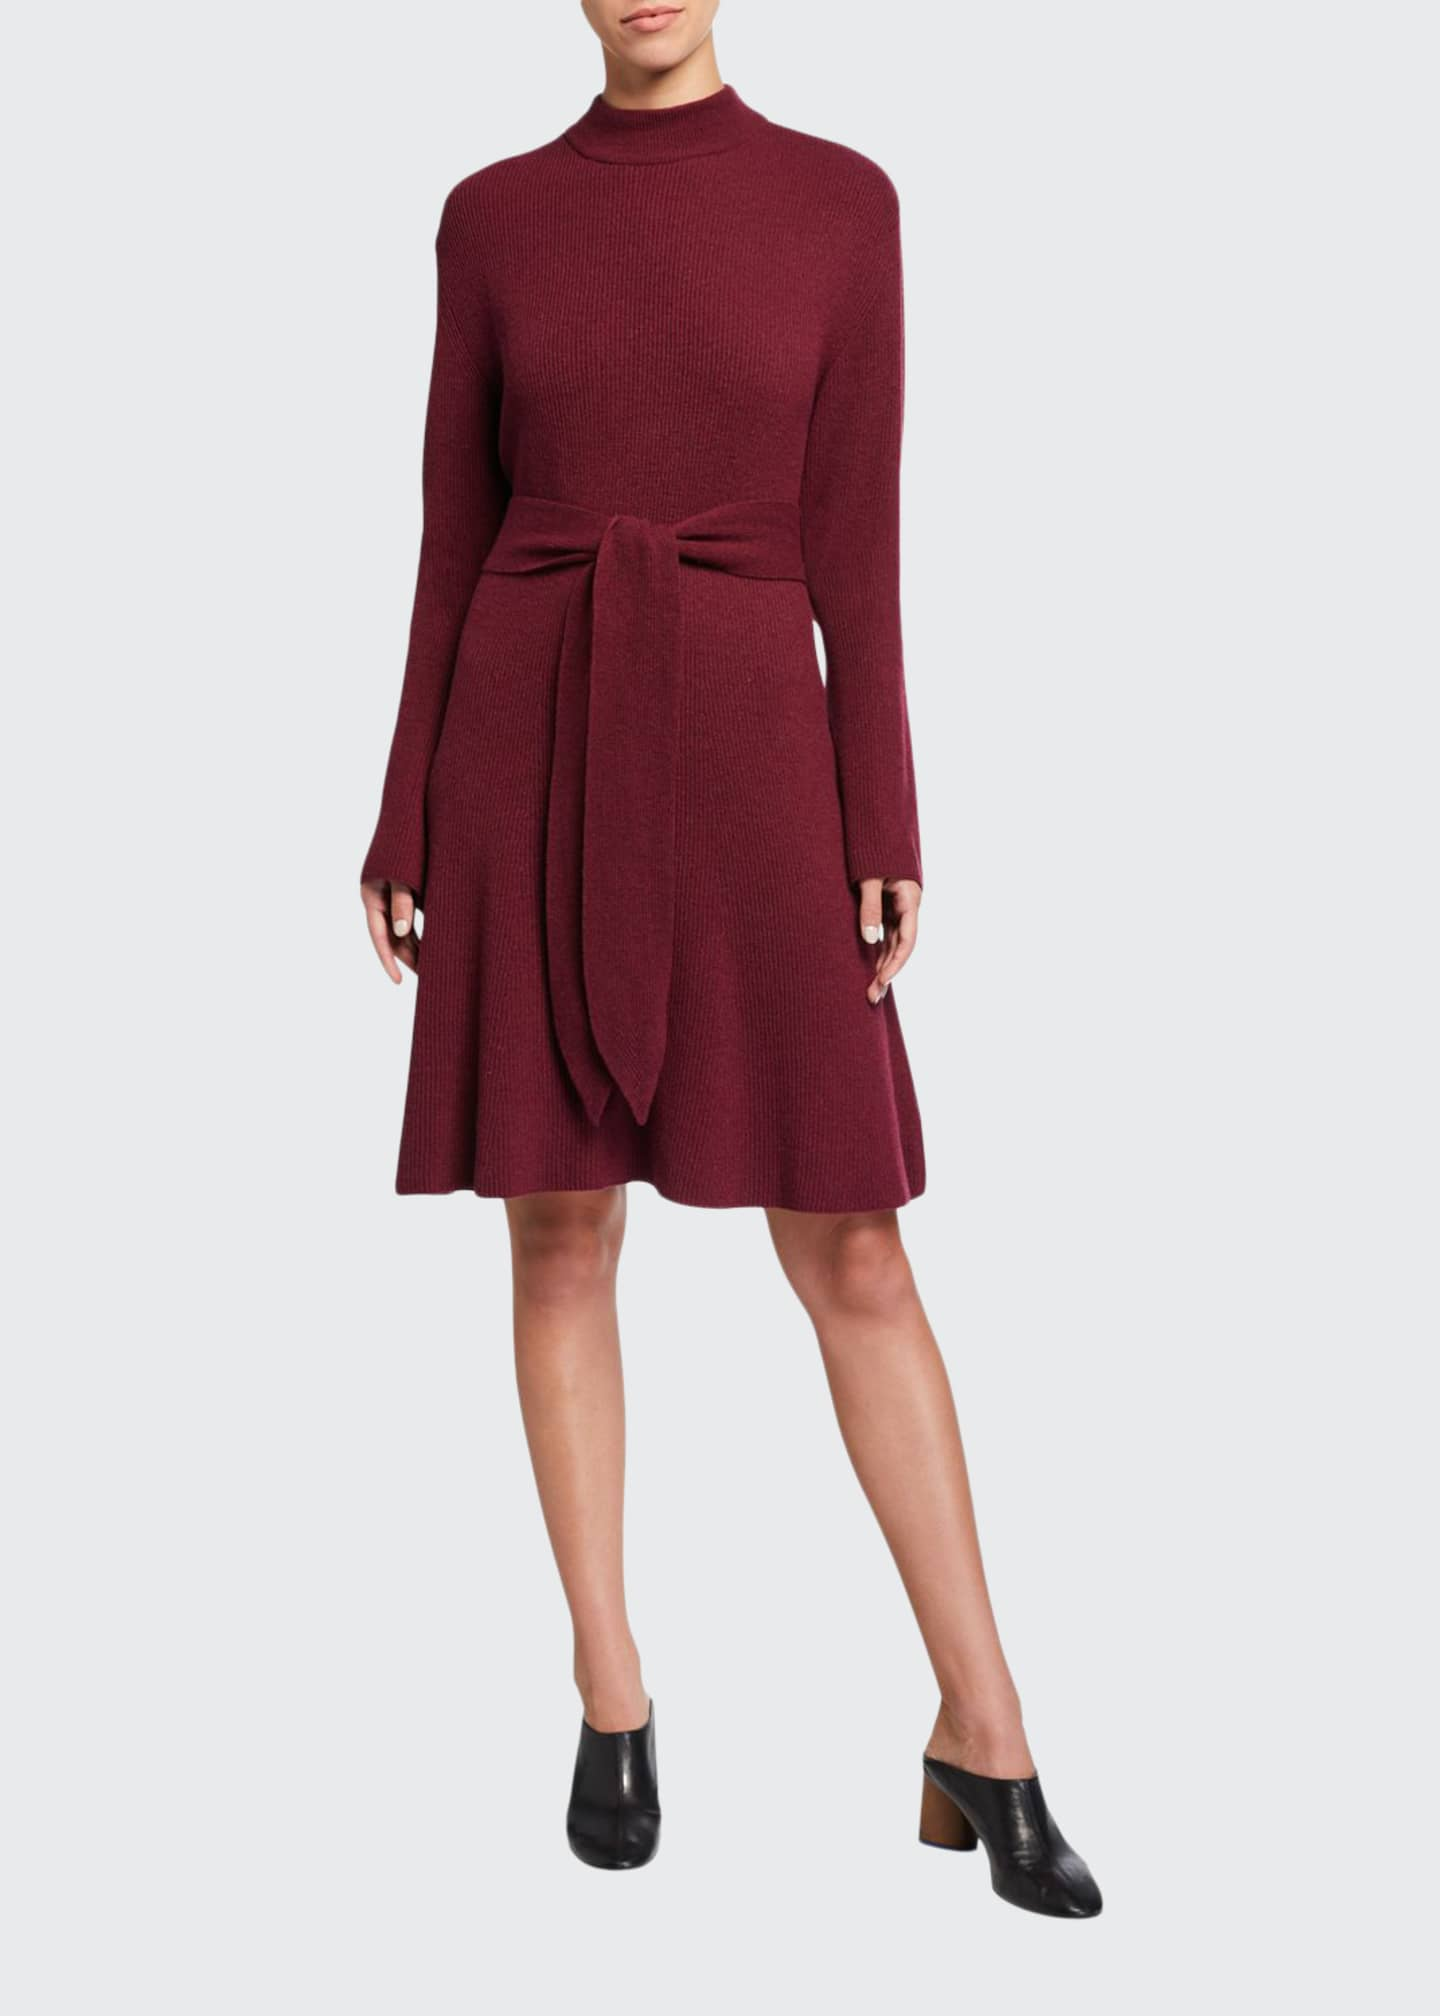 Nanushka Abhaya Tie-Waist Knit Sweater Dress